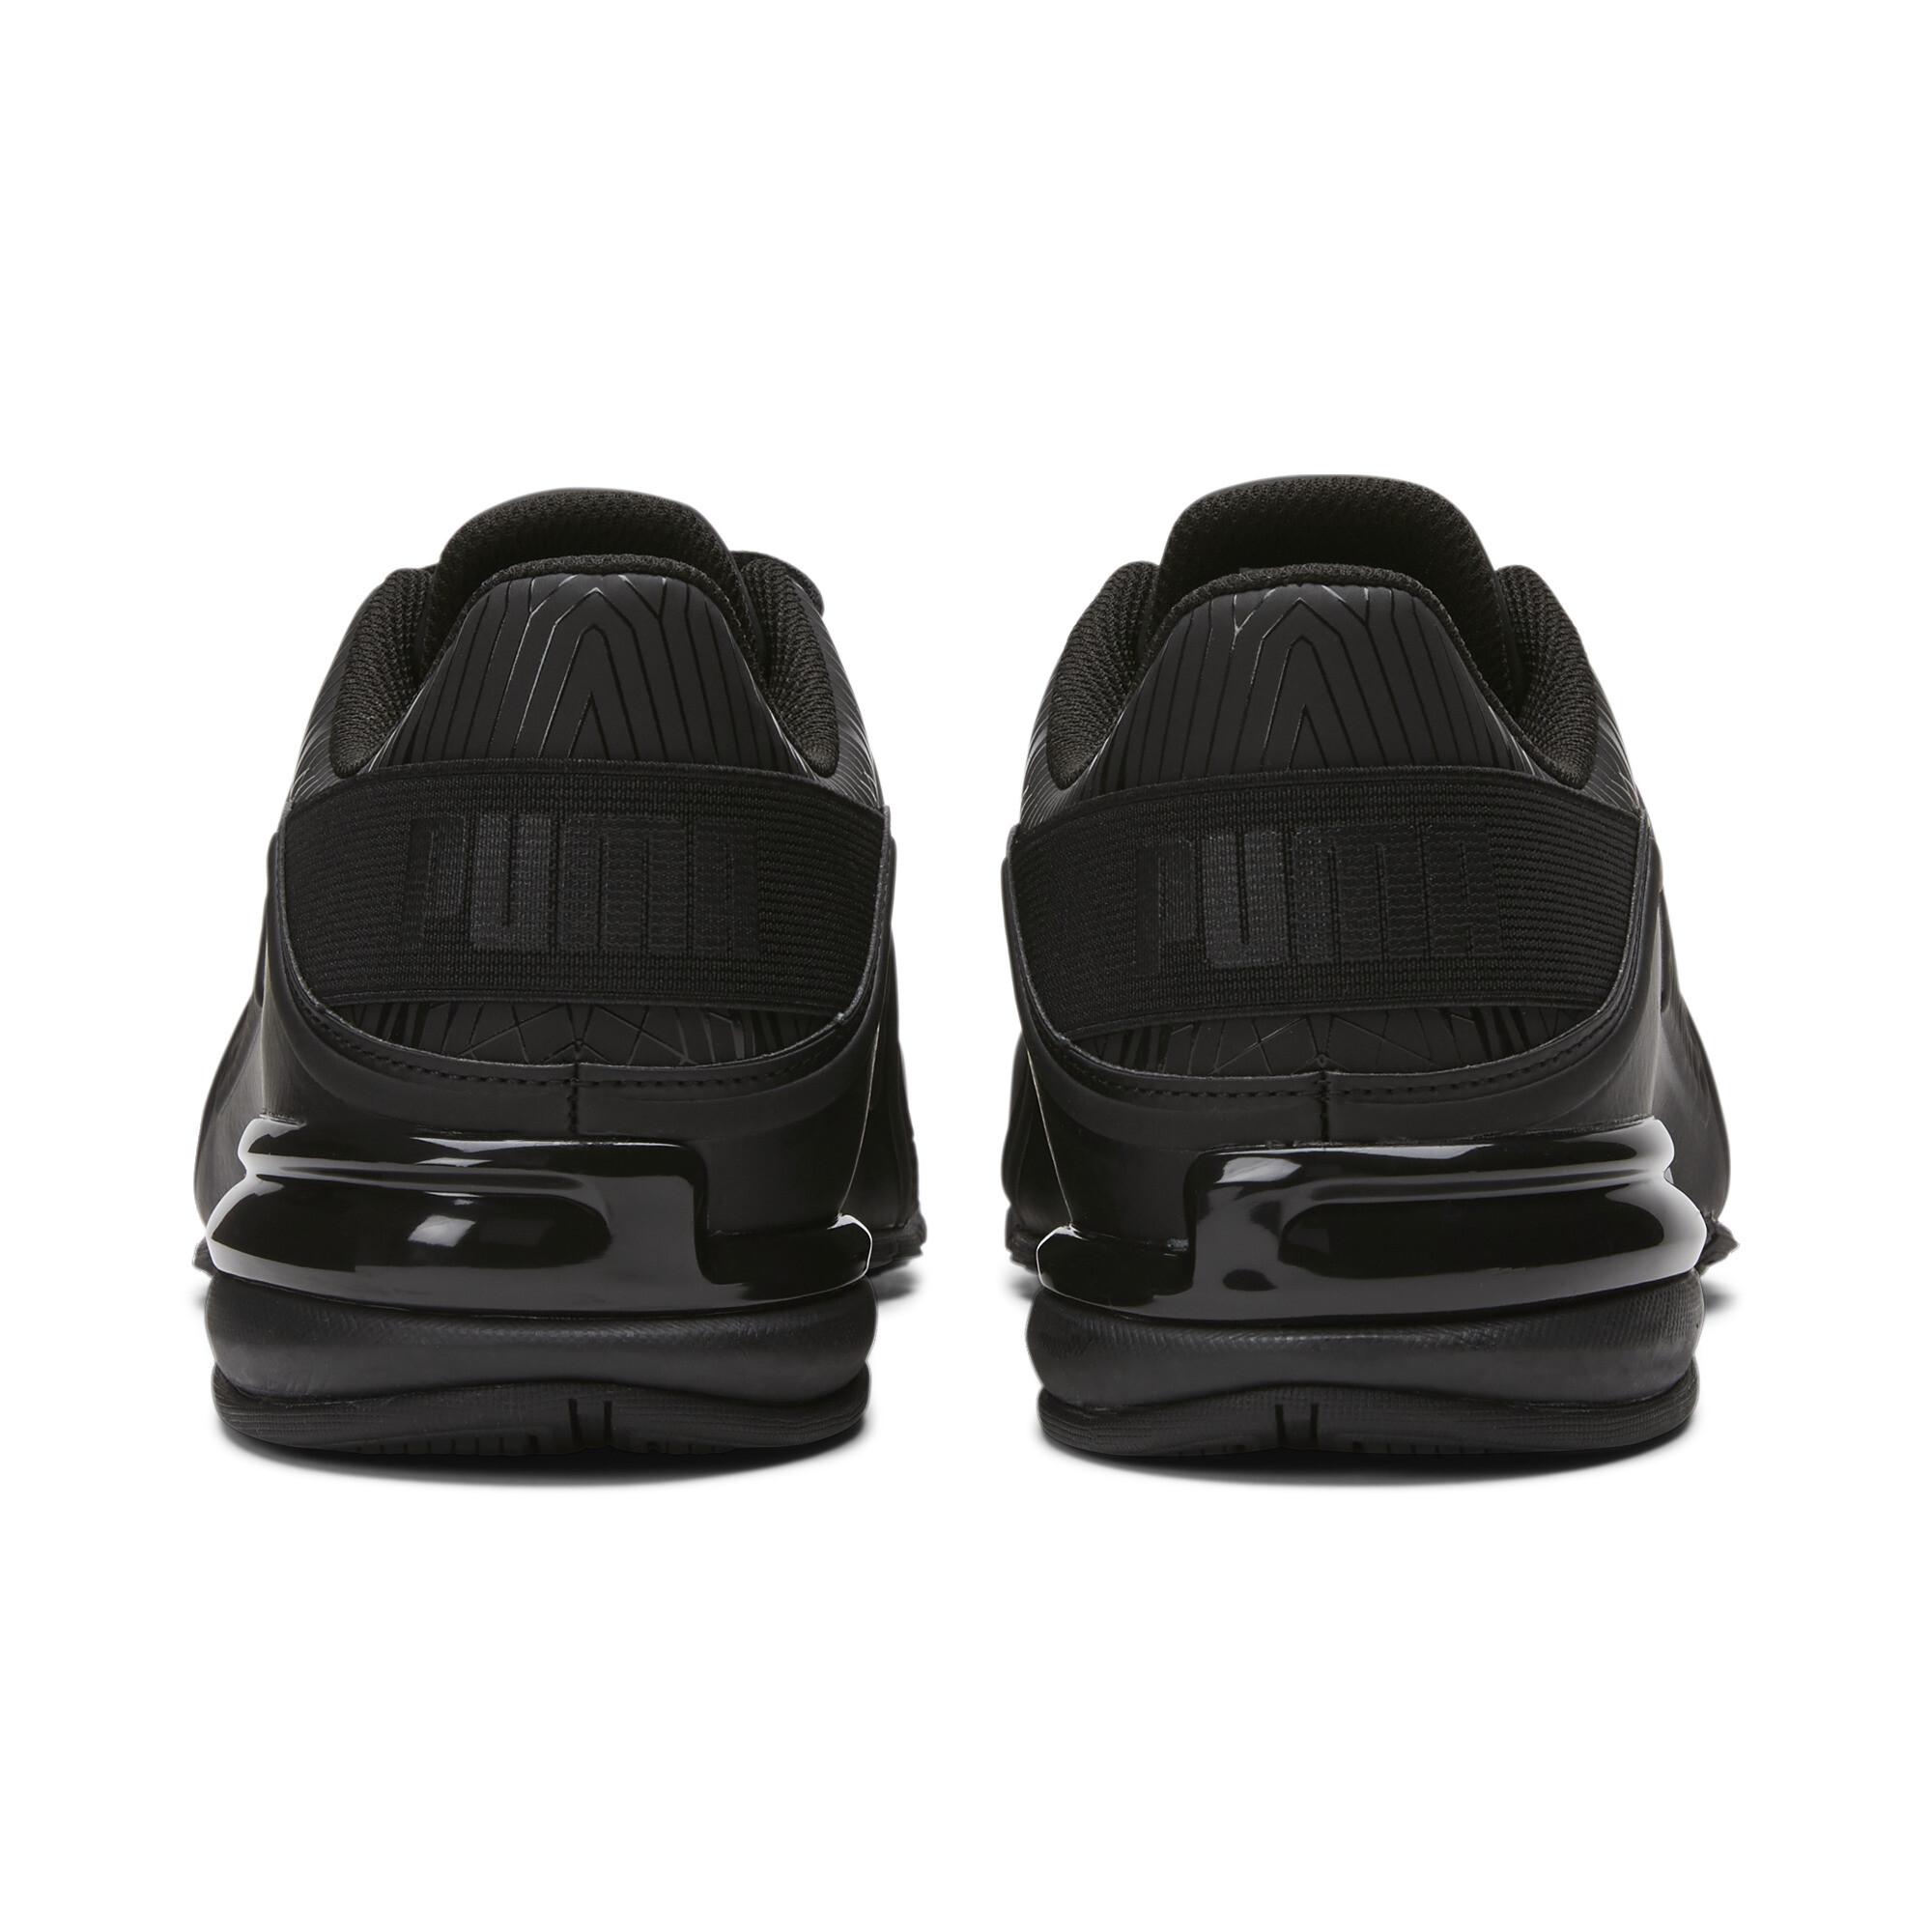 PUMA-Men-039-s-Viz-Runner-Graphic-Sneakers thumbnail 26